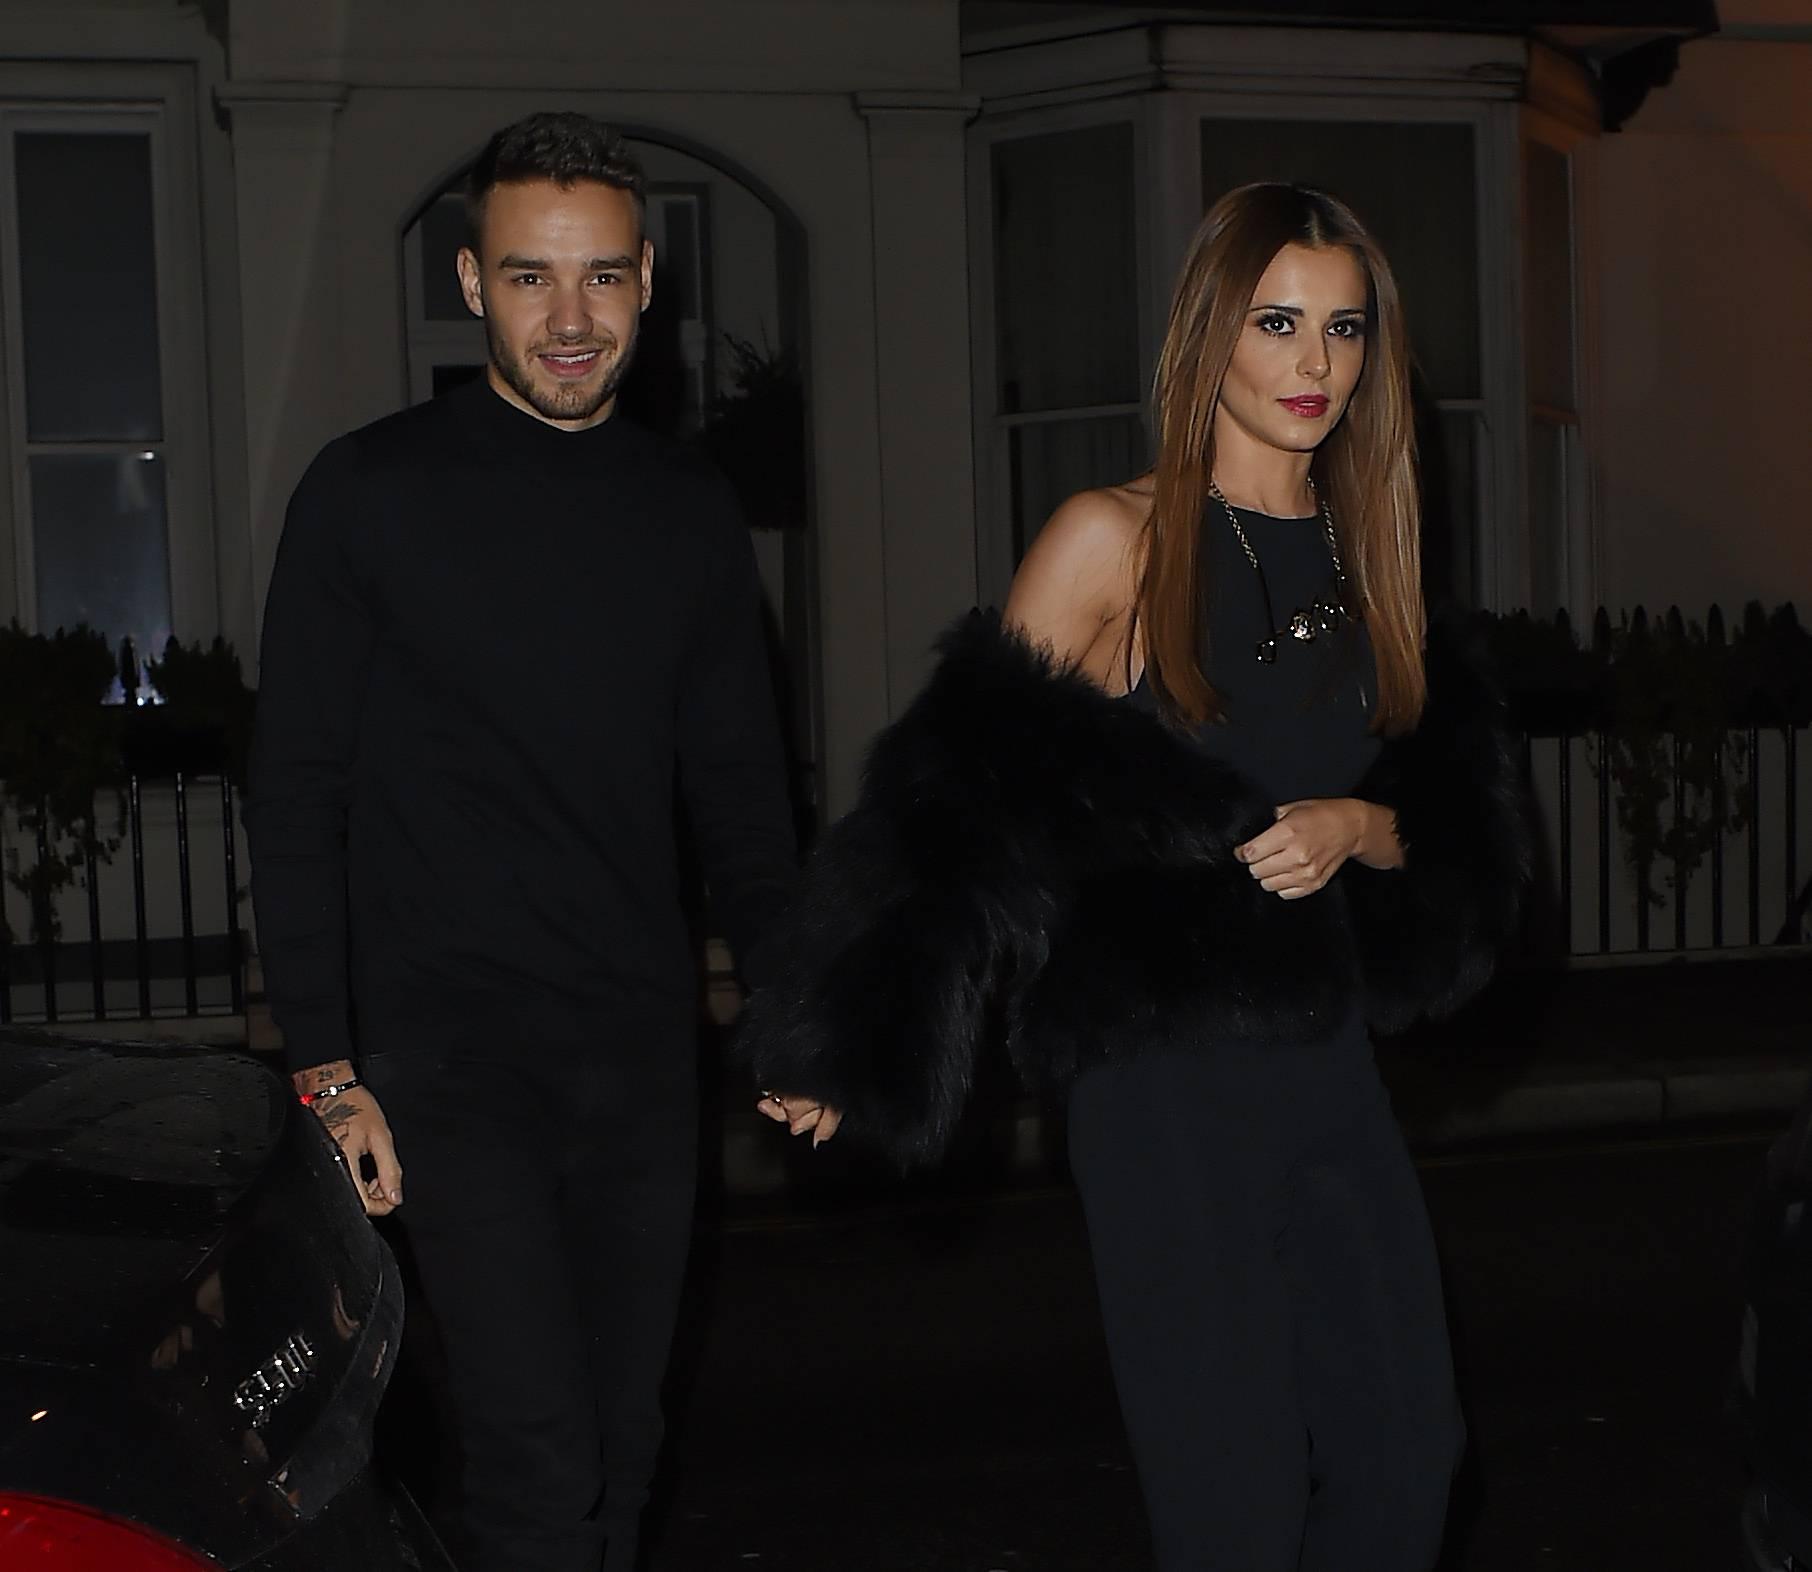 Cheryl Fernandez- Versini and Liam Payne hold hands on date night.